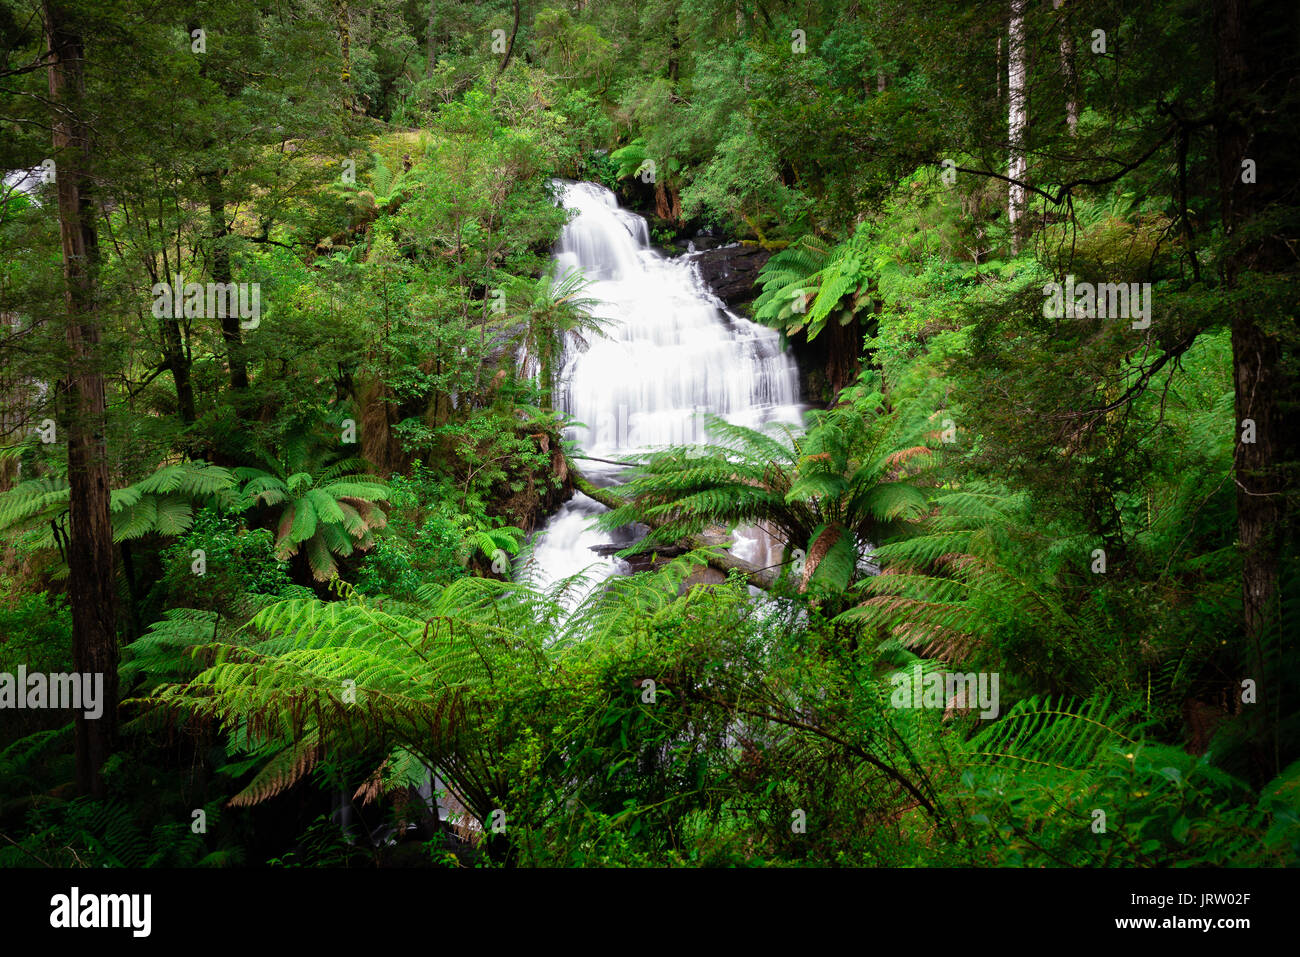 Triplet Falls in Otways National Park, Victoria. - Stock Image